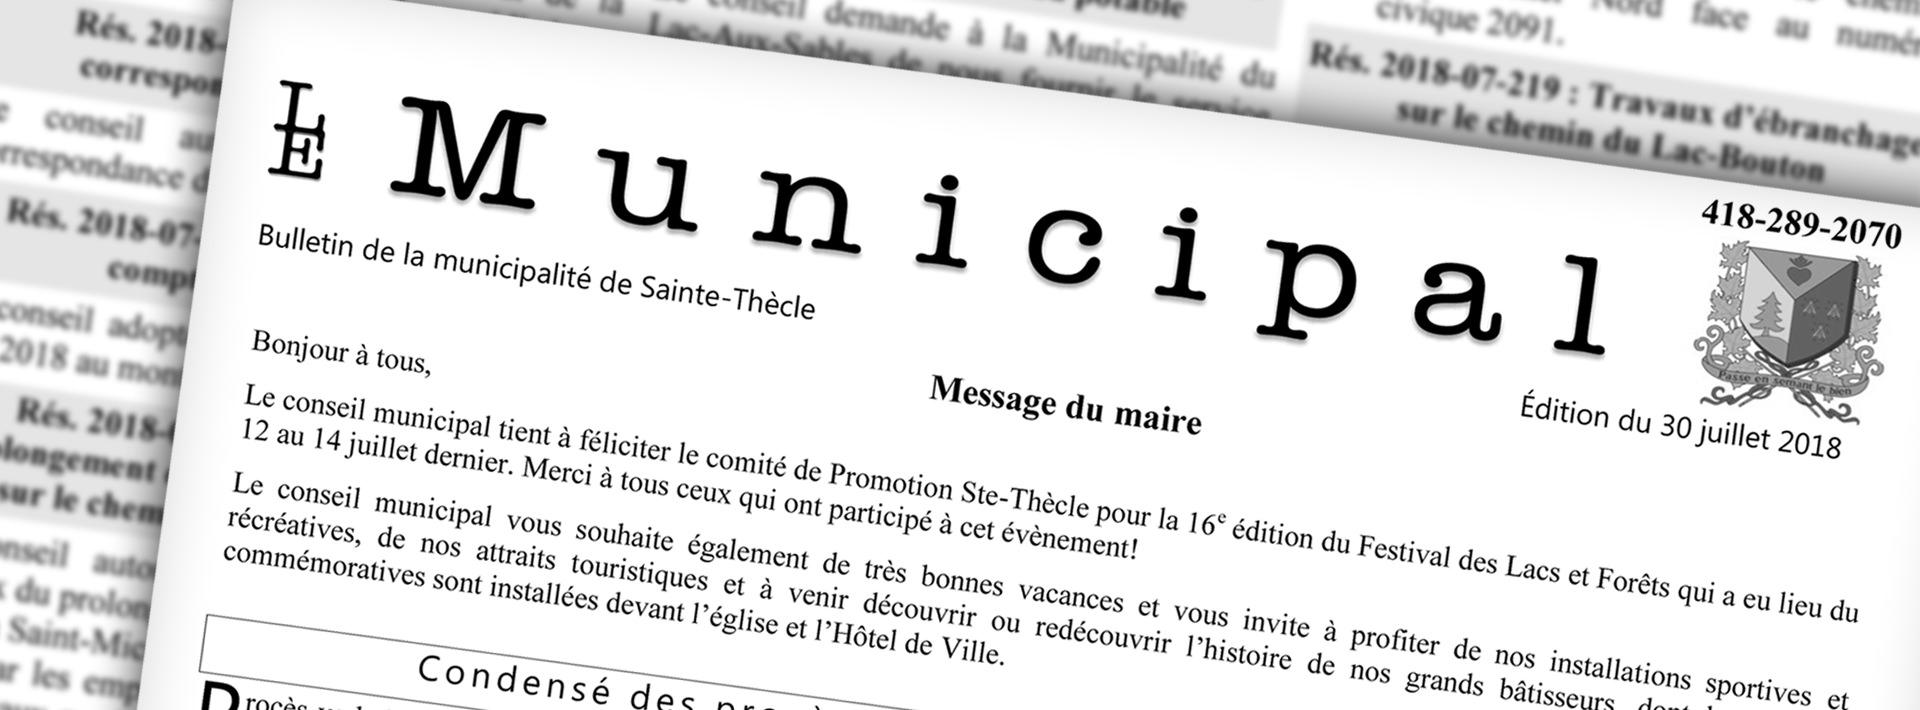 Image en-tête - Bulletin municipal